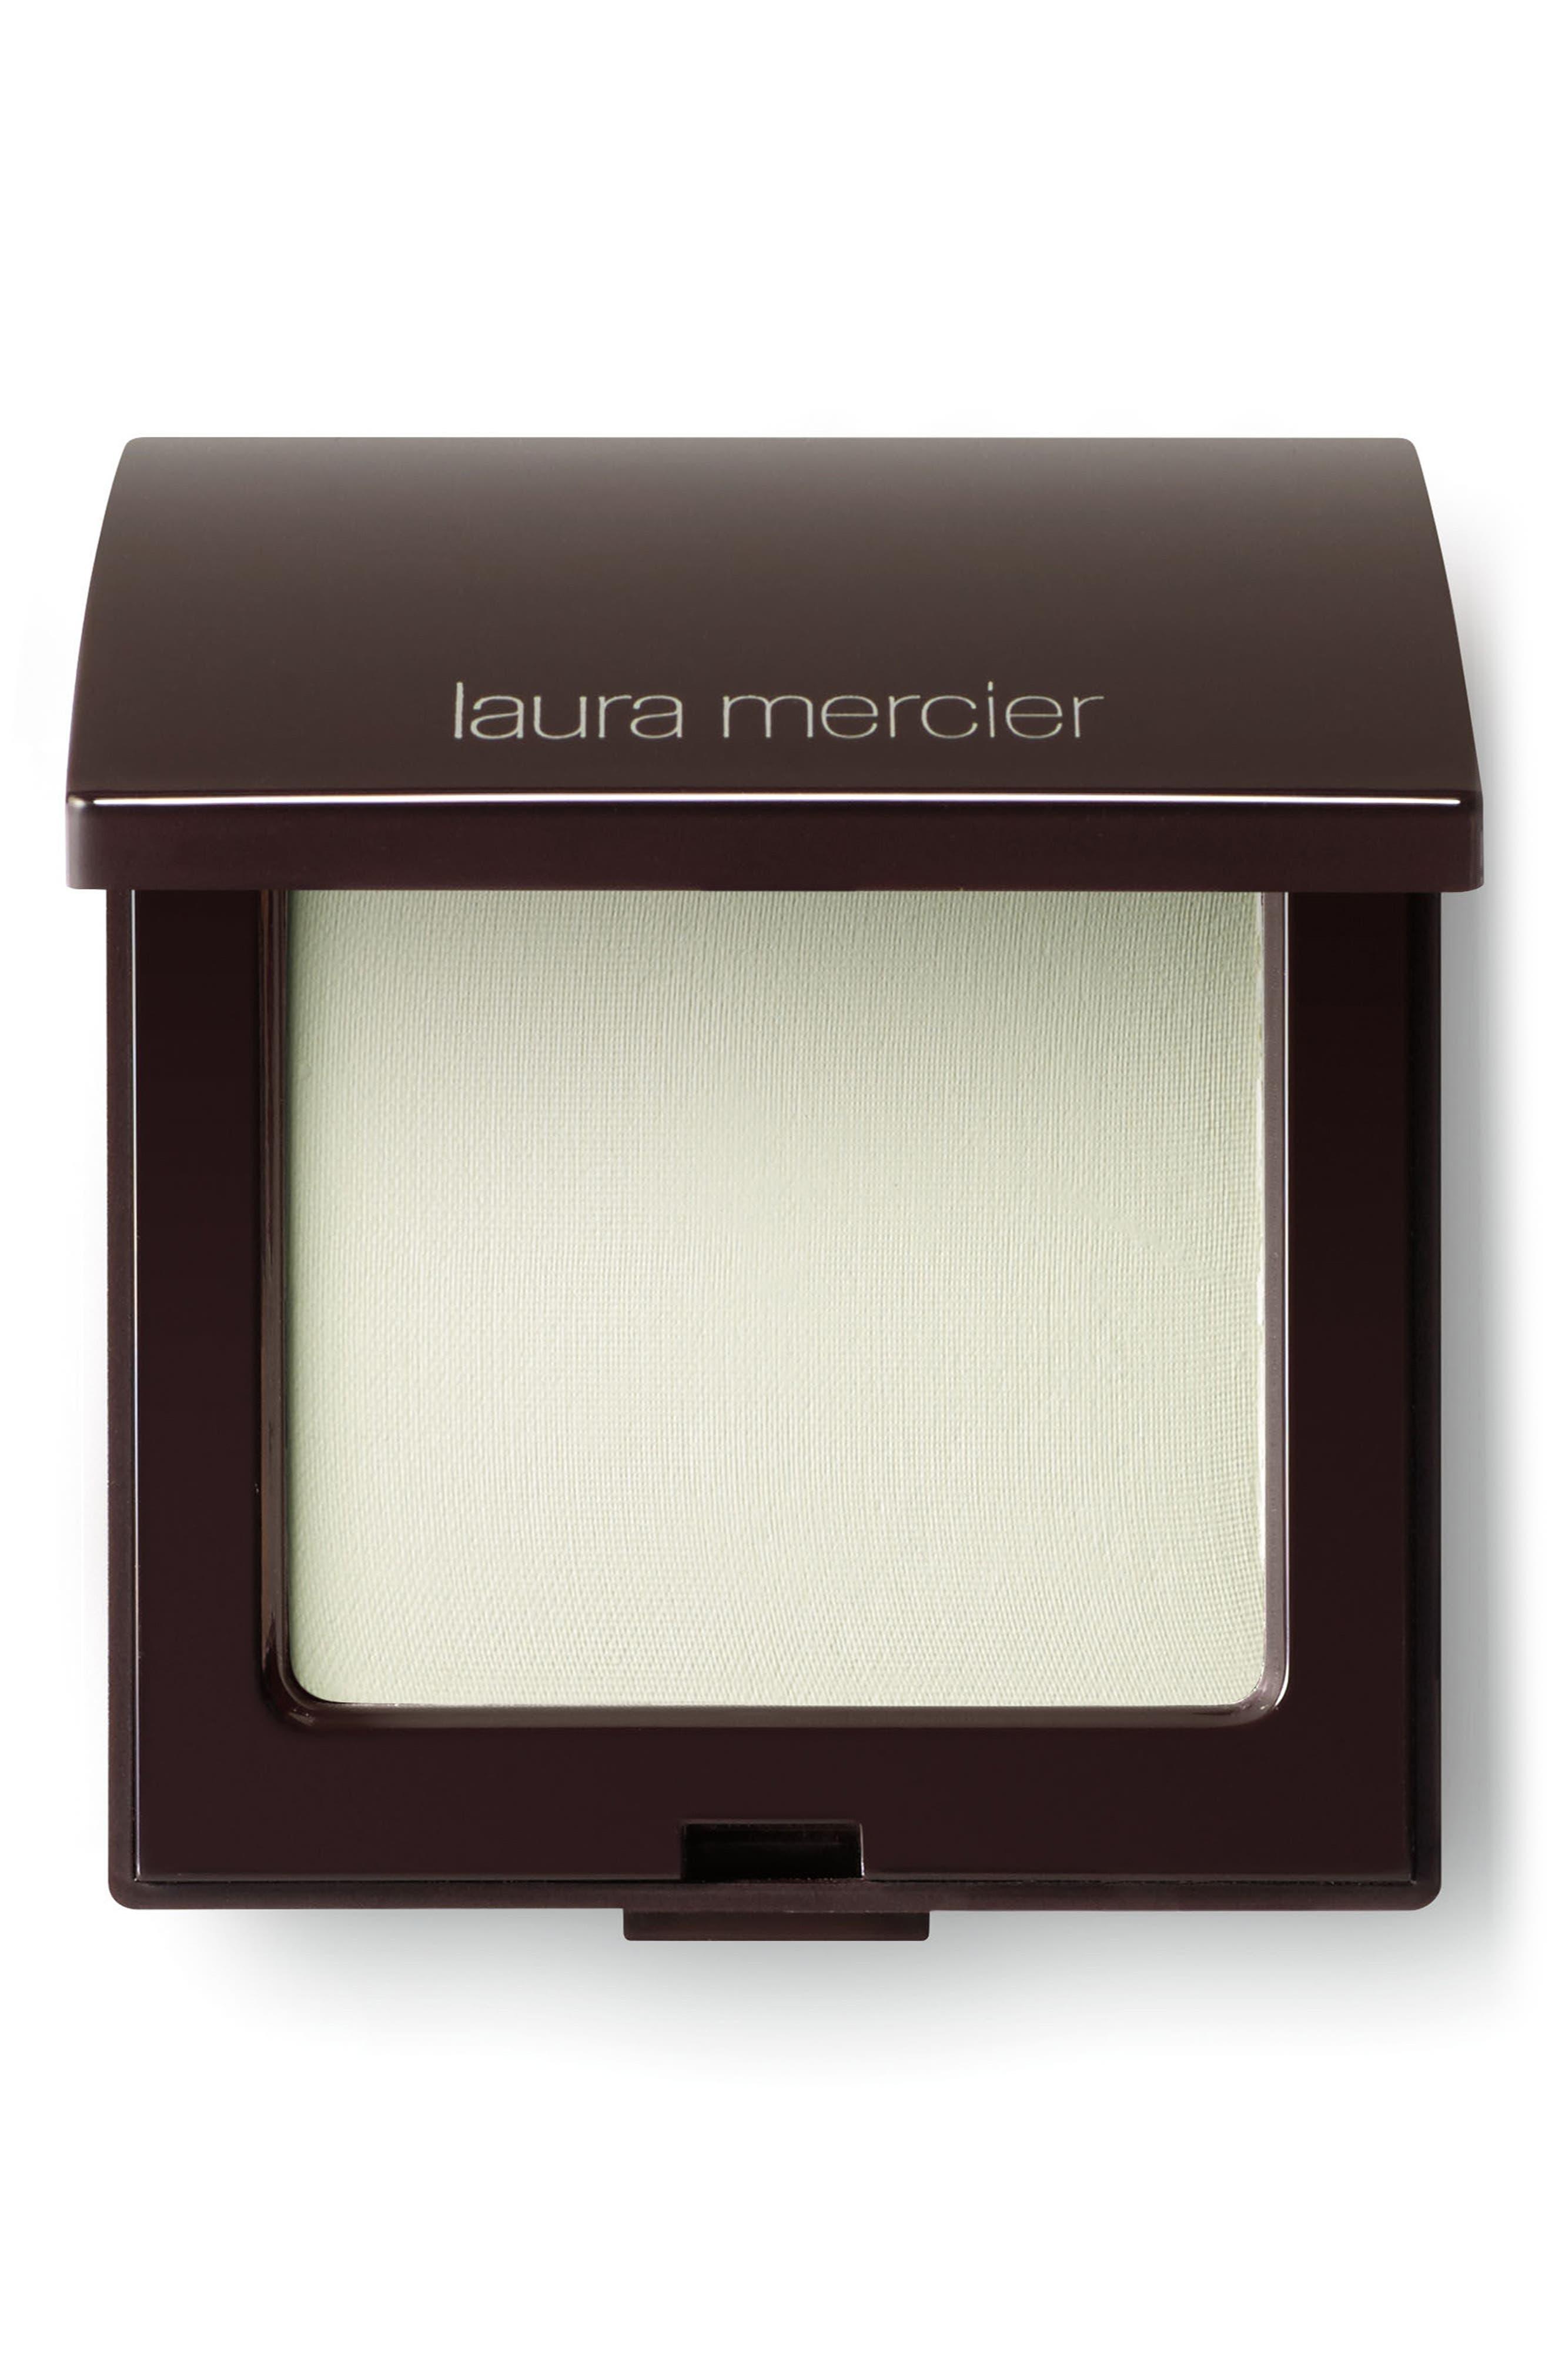 Alternate Image 1 Selected - Laura Mercier 'Smooth Focus' Pressed Setting Powder